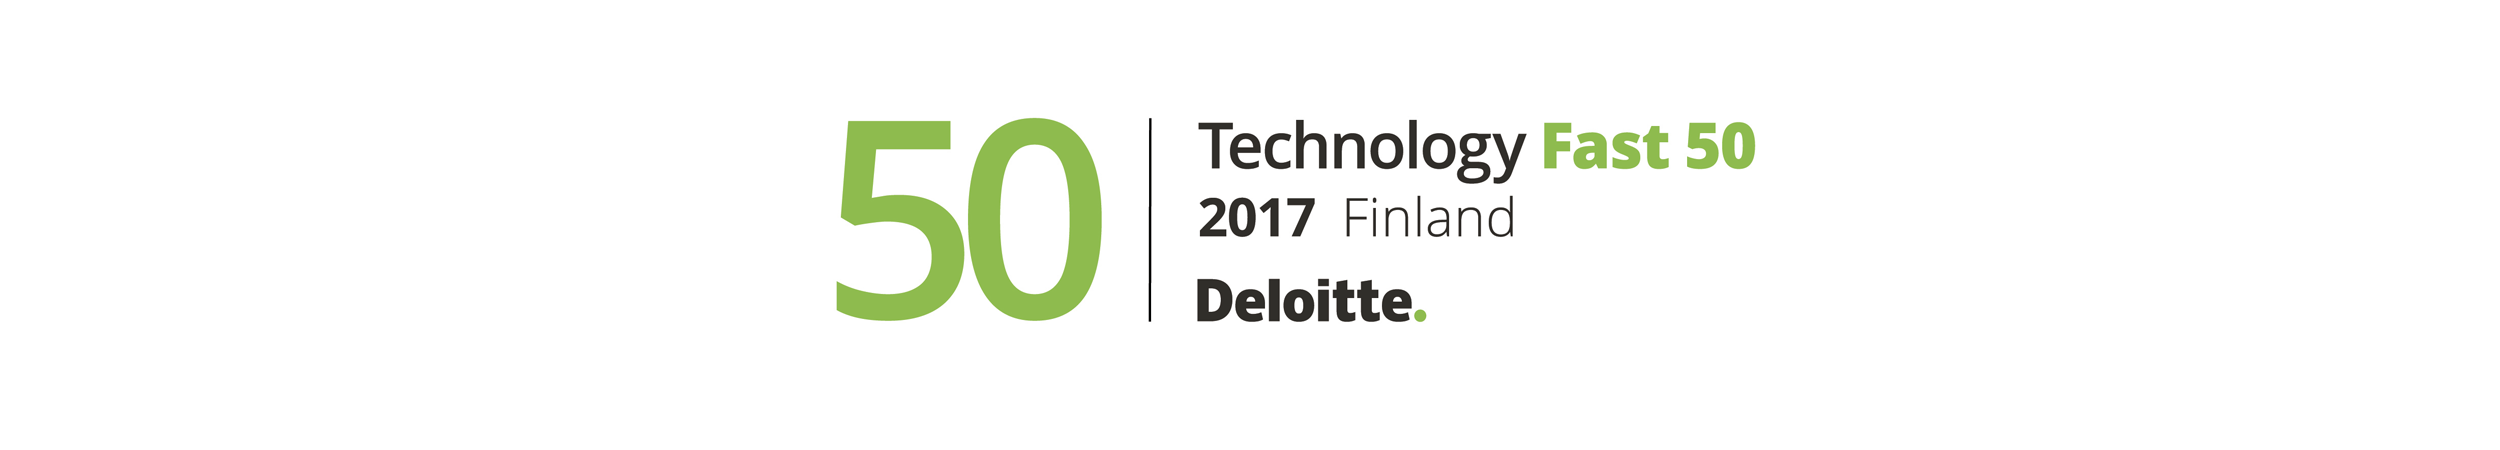 Deloitte listaus 2017 Lamia